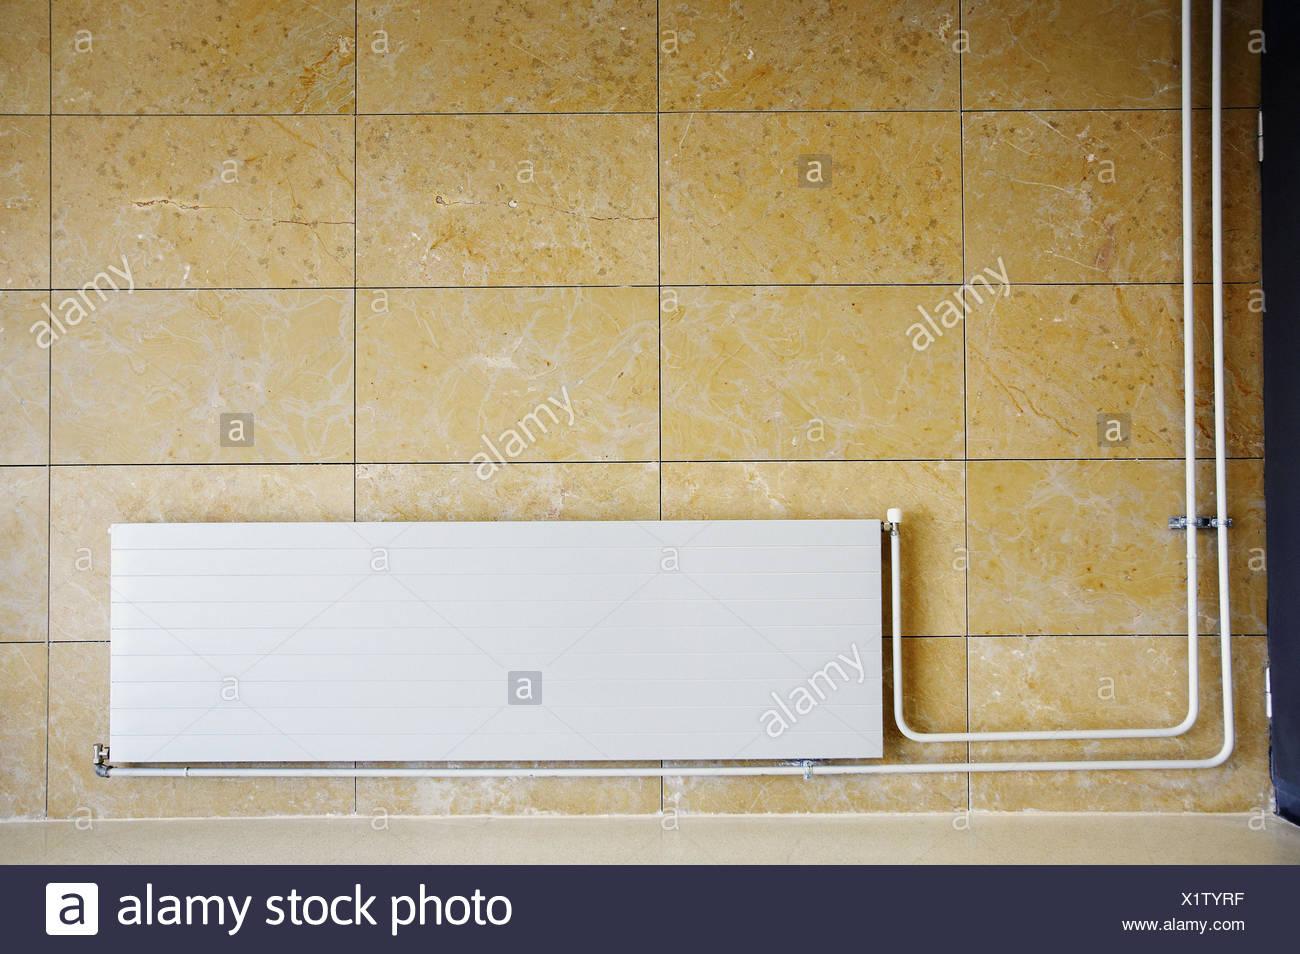 Full Size of Heizkrper Escuela Universitaria Politecnica Heizkörper Badezimmer Bad Für Elektroheizkörper Wohnzimmer Wohnzimmer Vasco Heizkörper